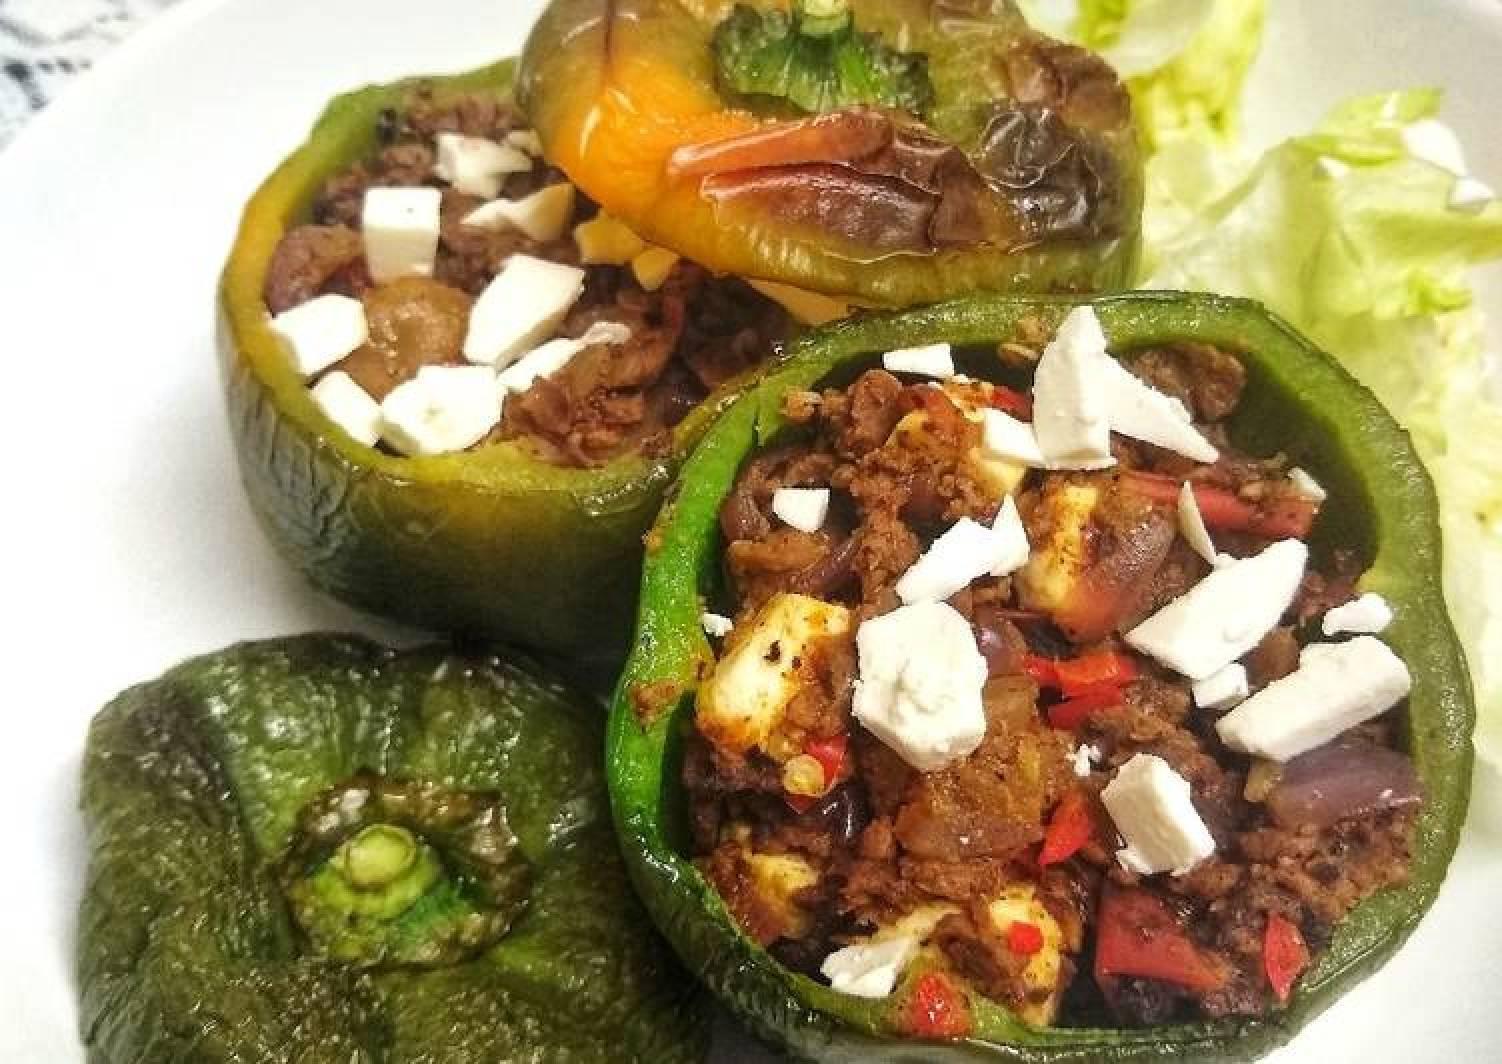 Stuffed Peppers With Feta (Vegetarian)